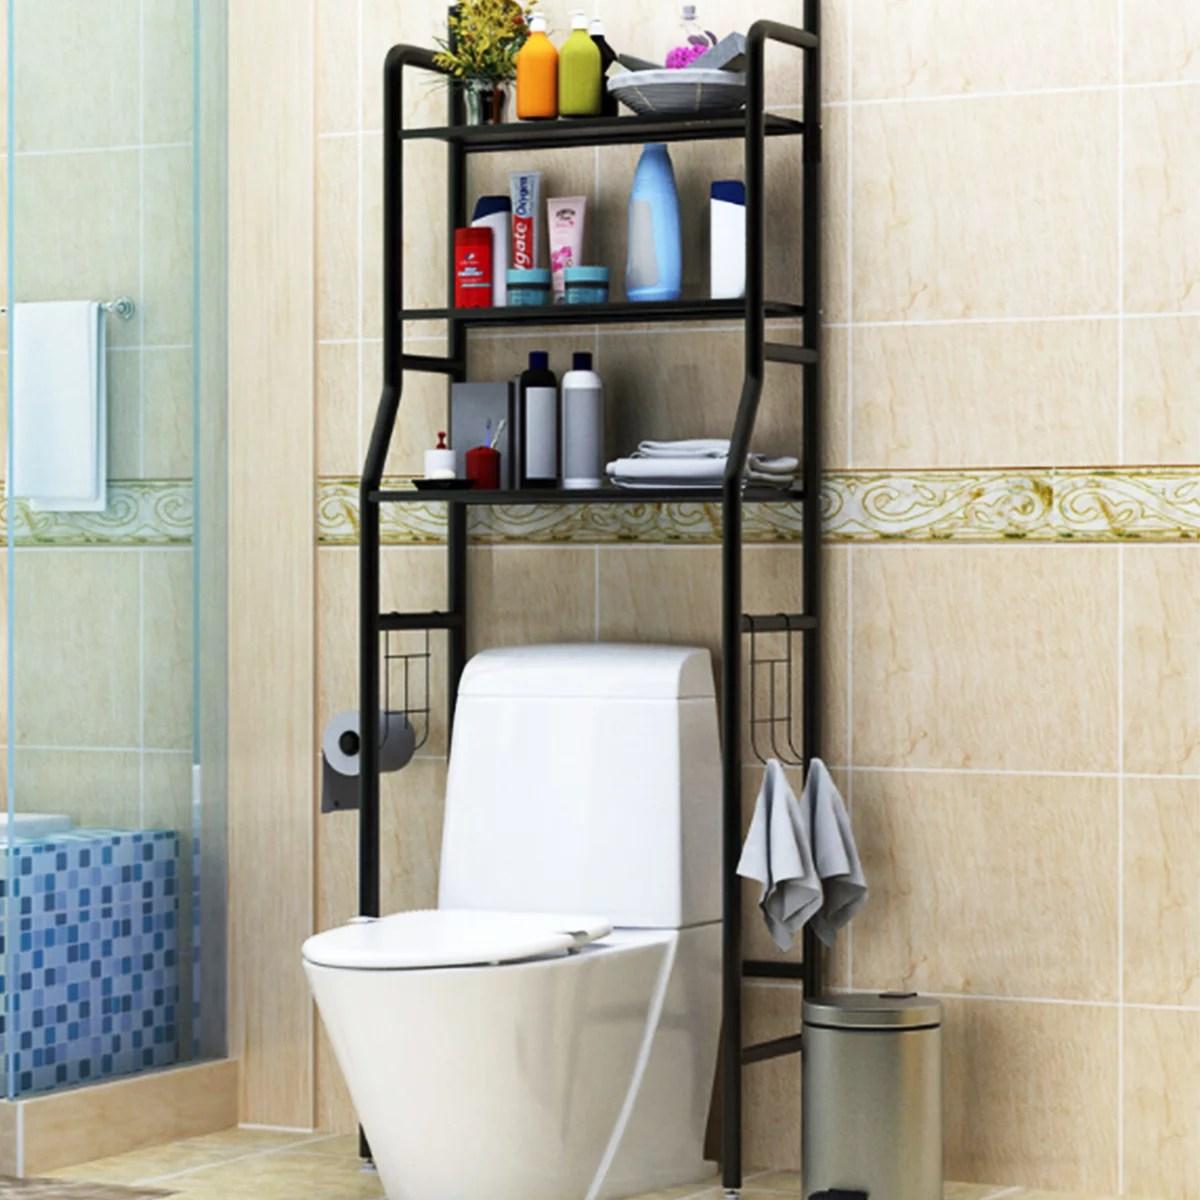 63 Height Towel Storage Rack 3 Tier Over Toilet Laundry Washing Machine Bathroom Shelf Walmart Canada